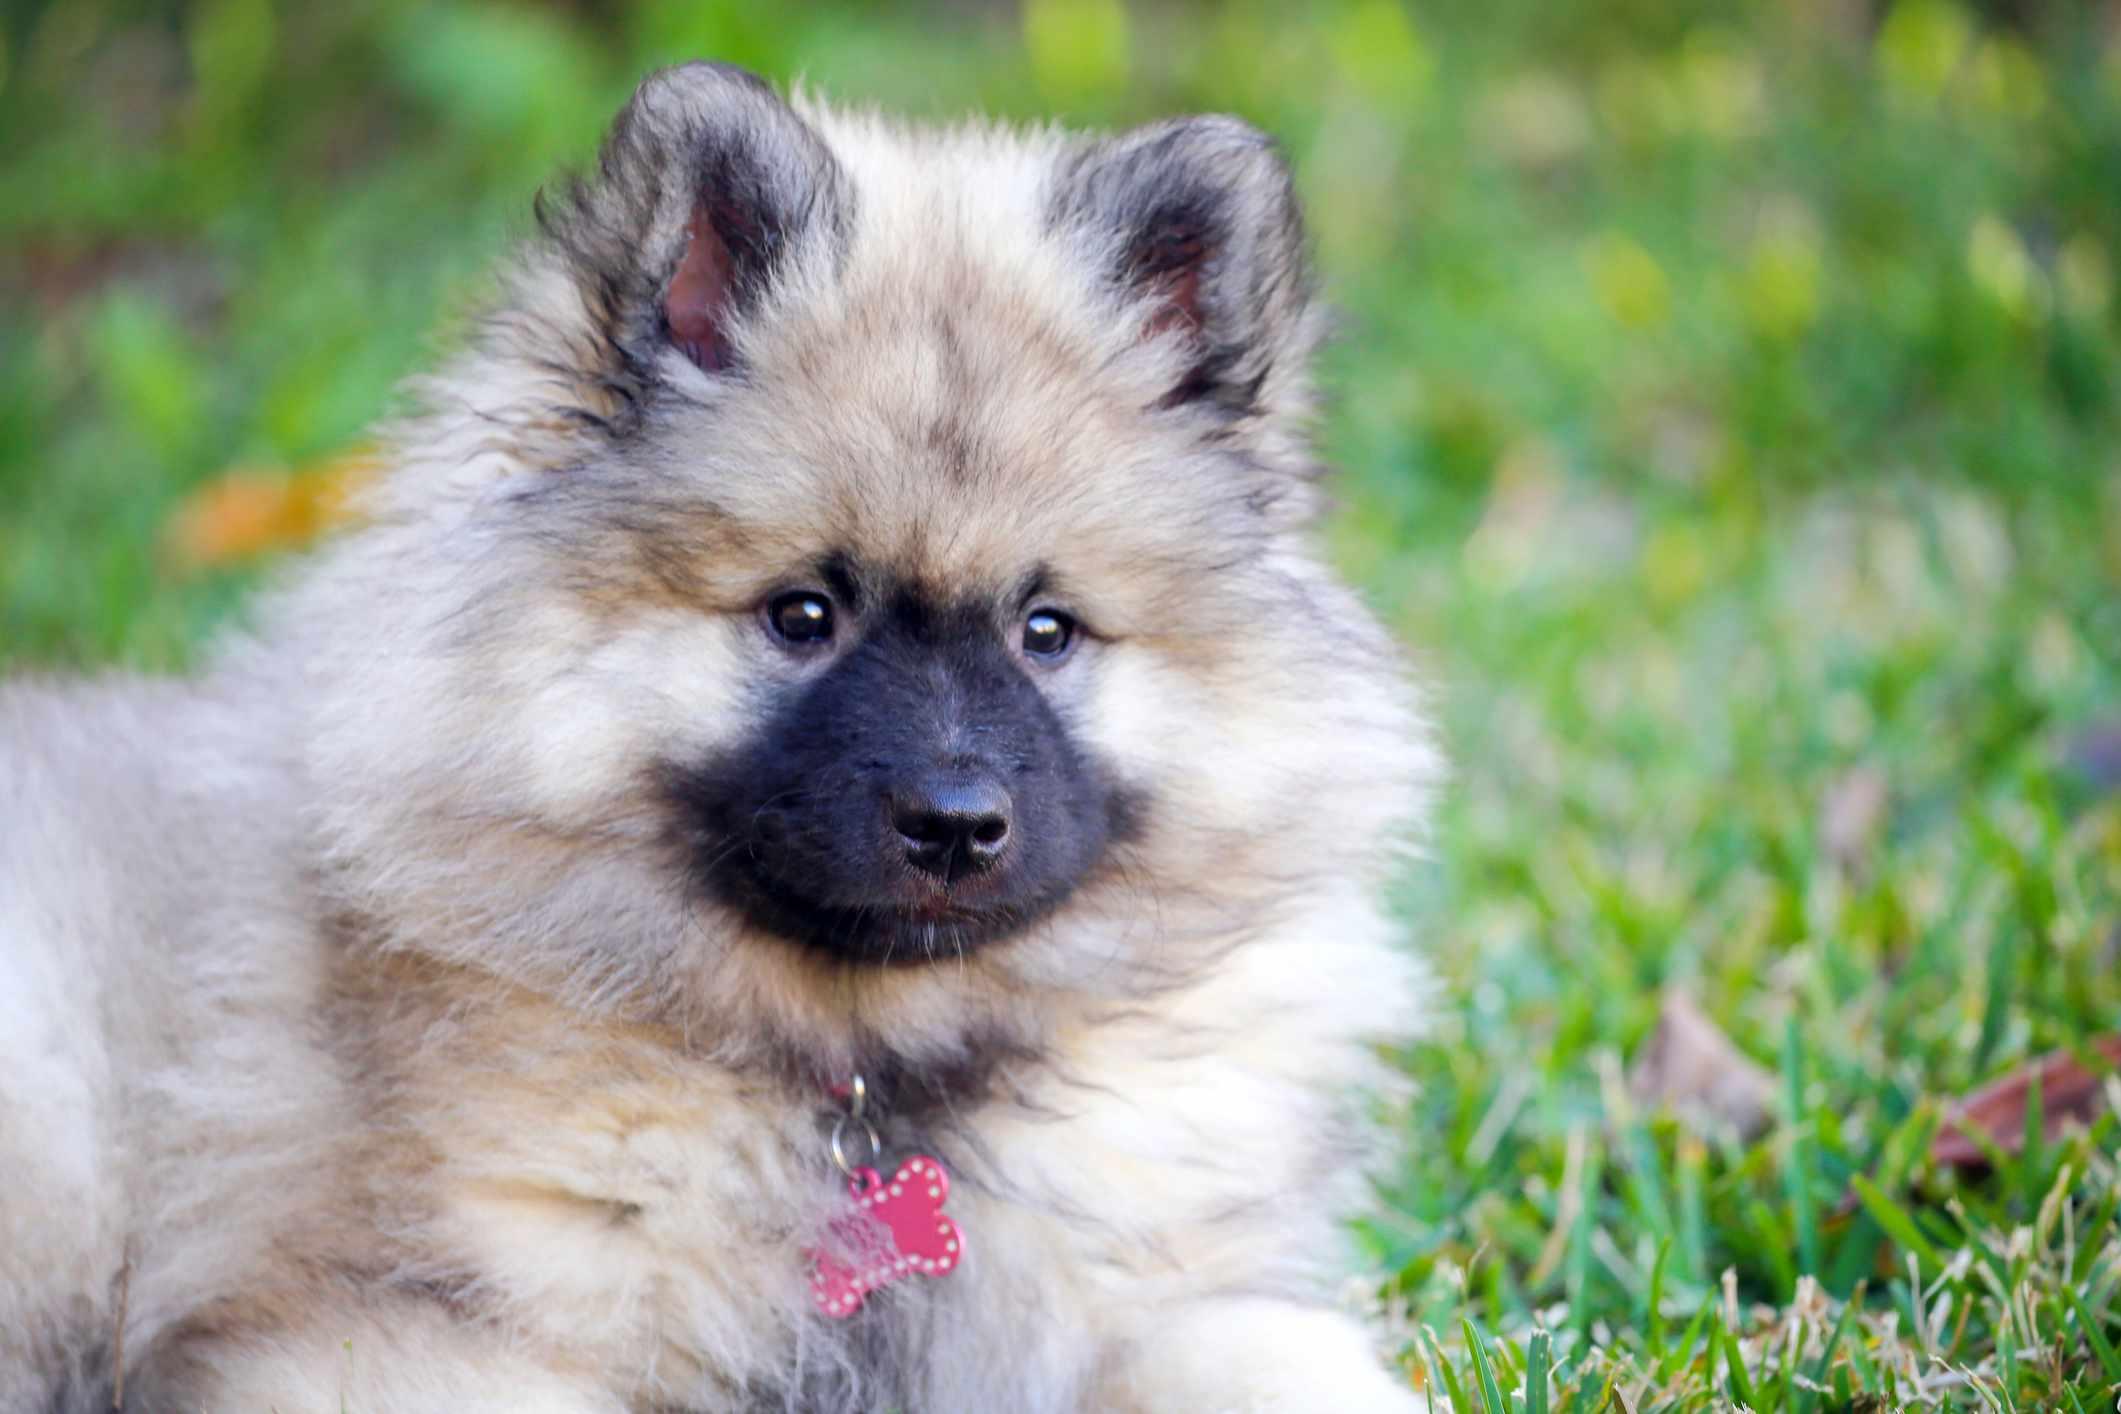 A Keeshond puppy